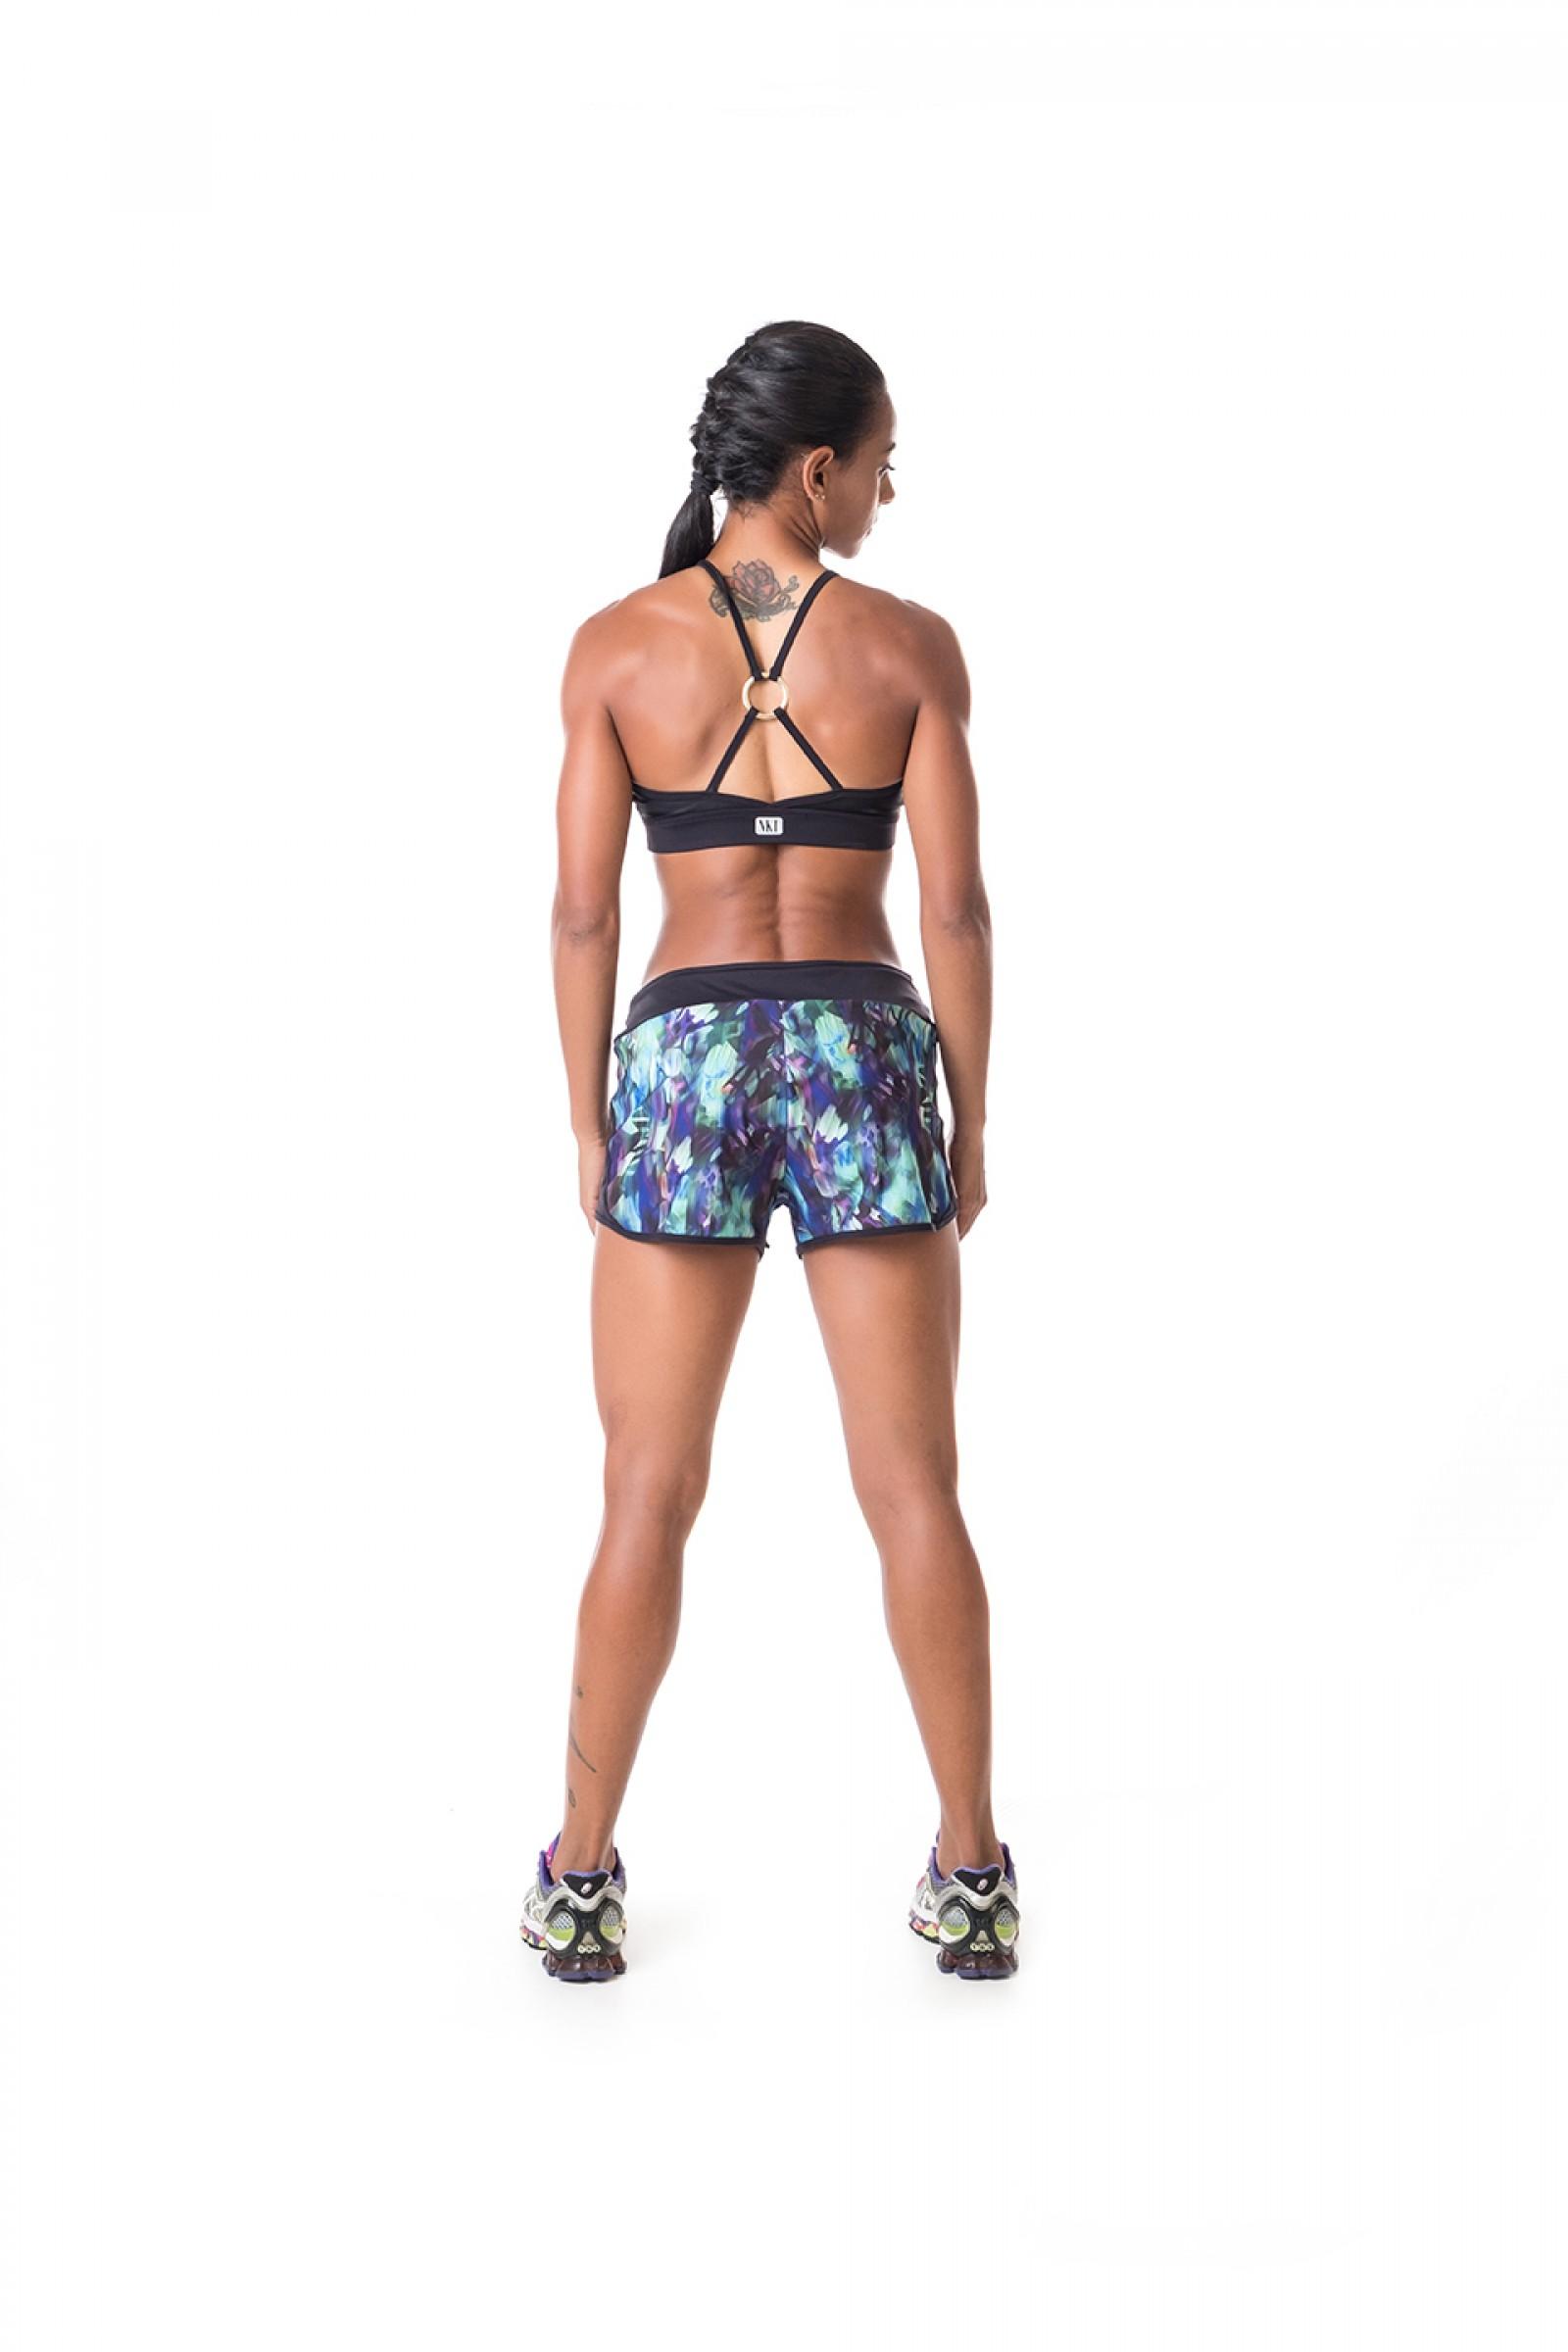 Top Infinity Preto Cirre, Coleção Challenge - NKT Fitwear Moda Fitness